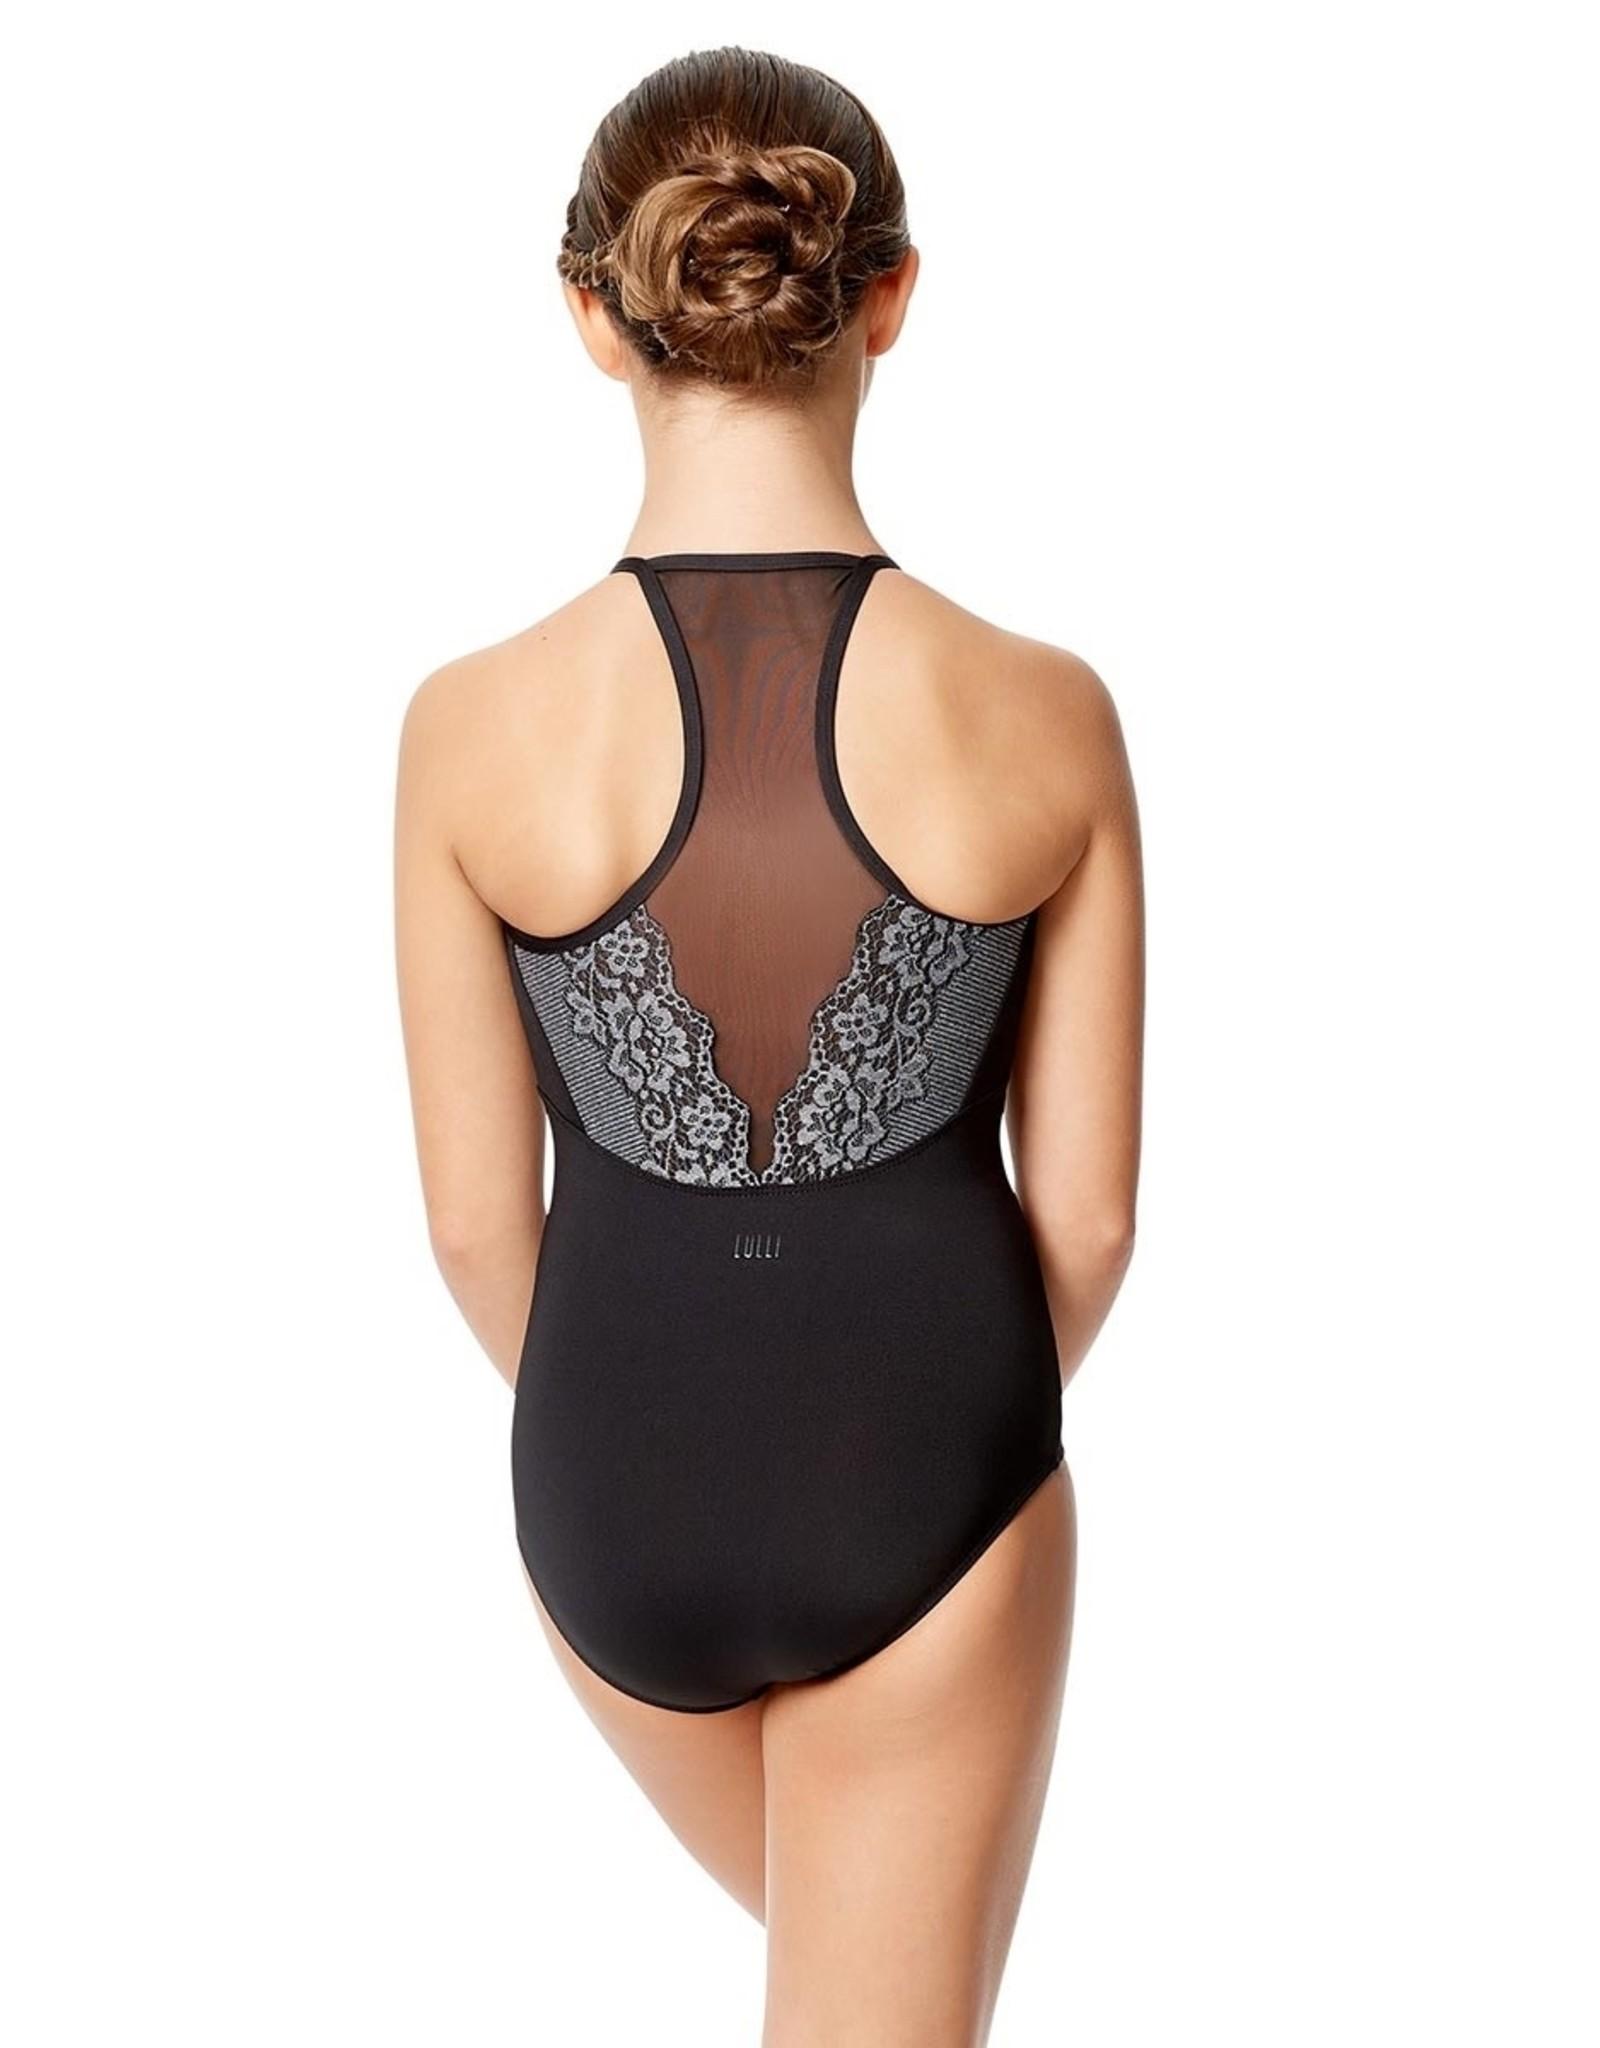 Lulli Dancewear Yoana Leotard Adult LUF599